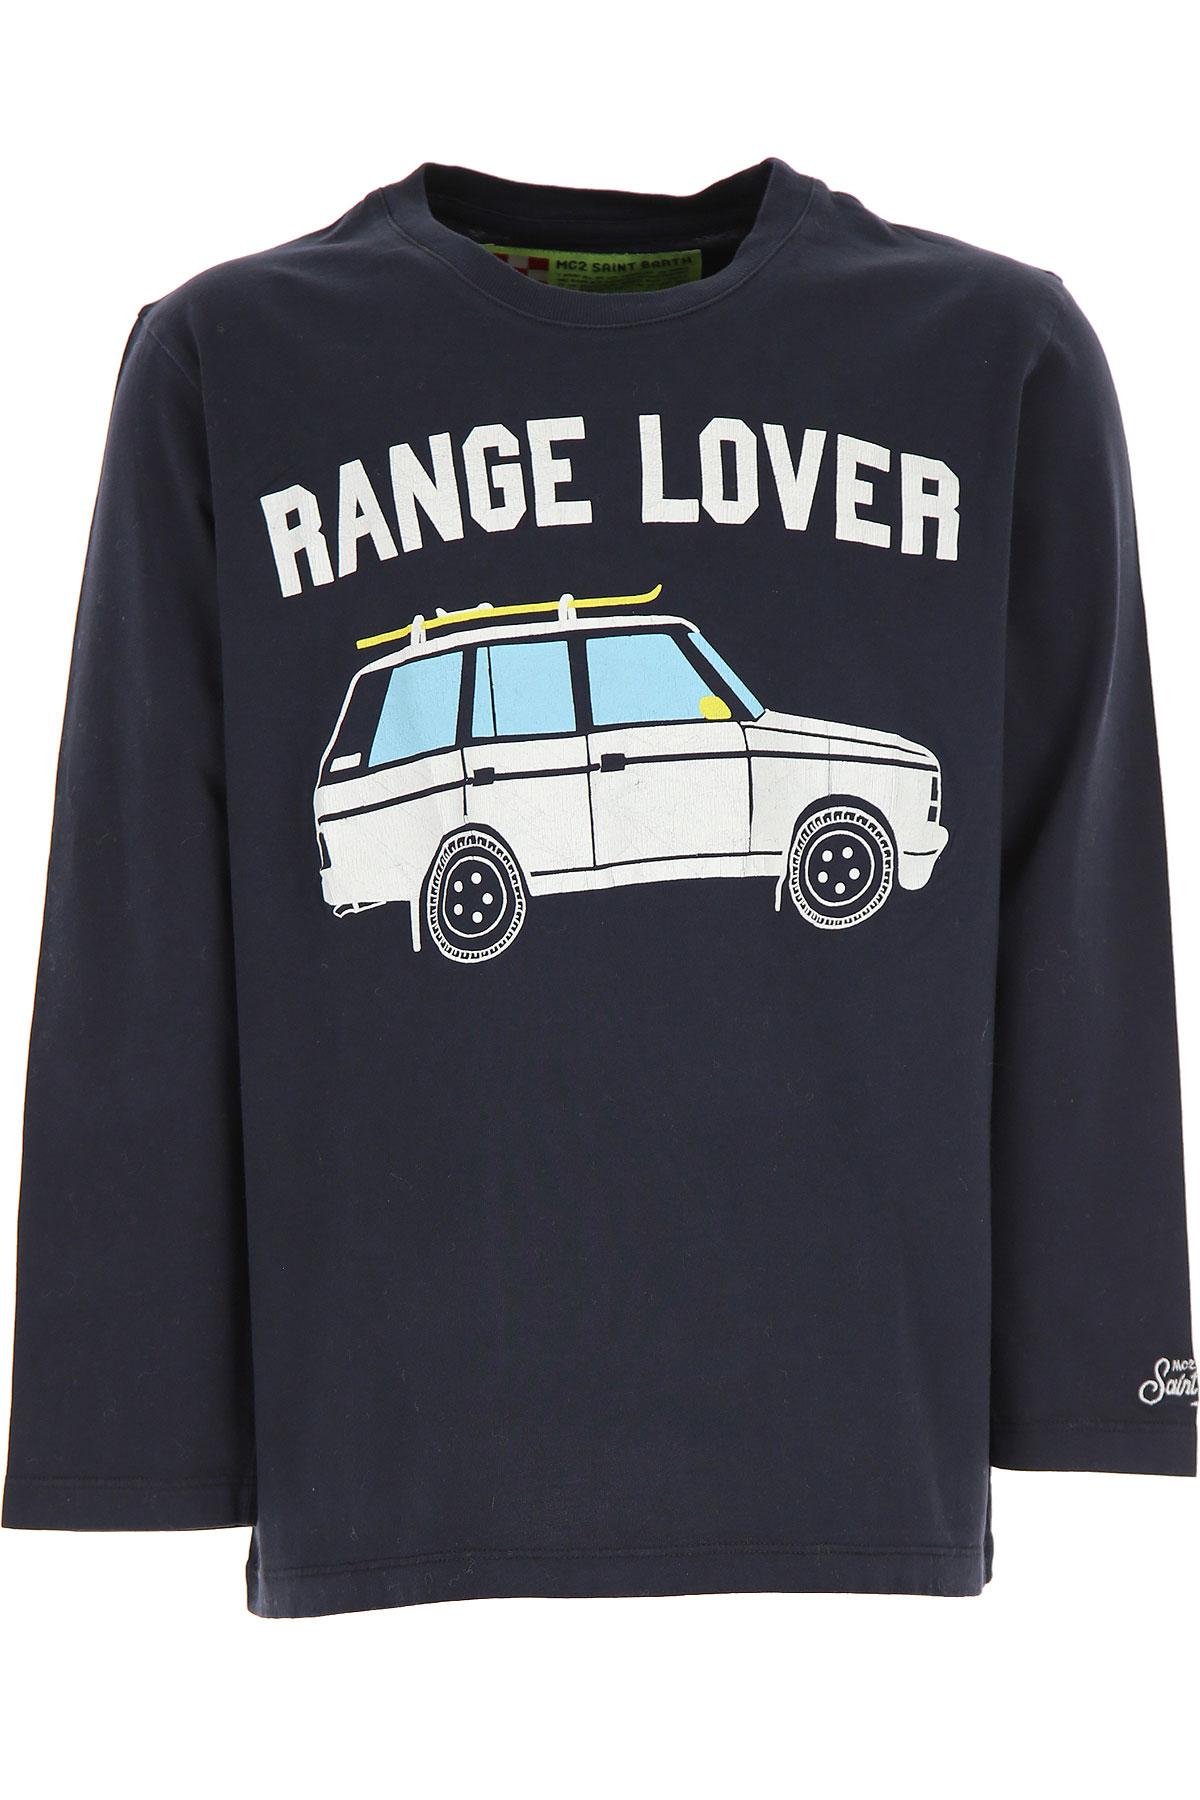 Mc2 Saint Barth Kids T-Shirt for Boys On Sale, Ink Blue, Cotton, 2019, 12Y 14Y 16Y 2Y 4Y 6Y 8Y